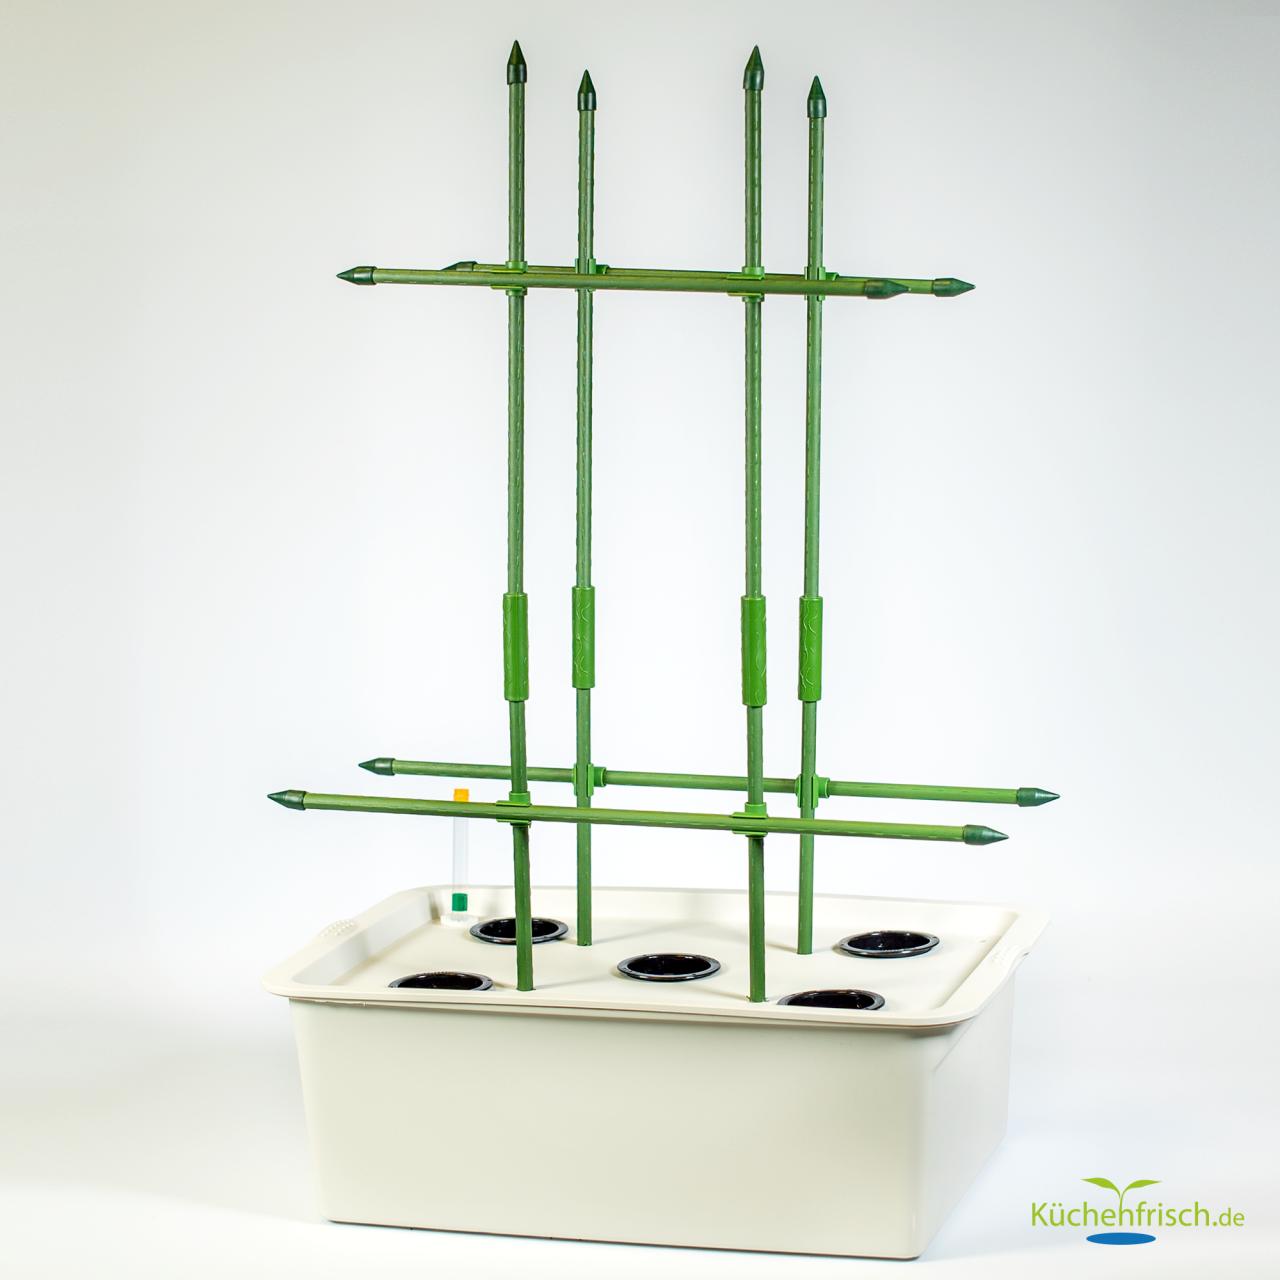 Indoorgarten DWC-Set 5 Pflanzen 03